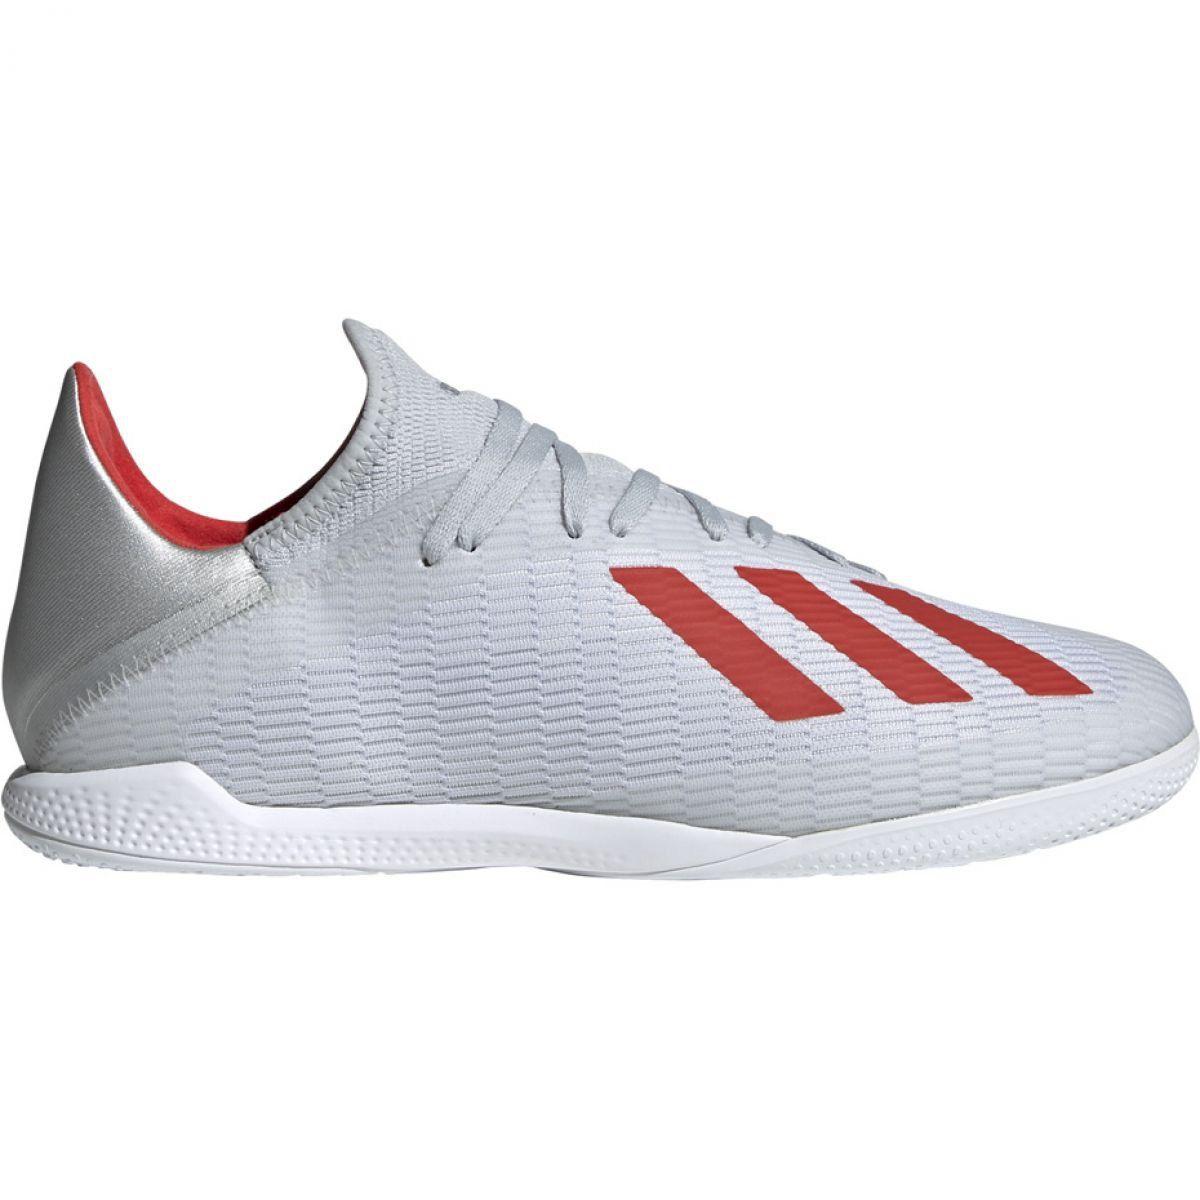 Buty Halowe Adidas X 19 3 In M F35370 Biale Wielokolorowe Indoor Shoe Adidas Shoes